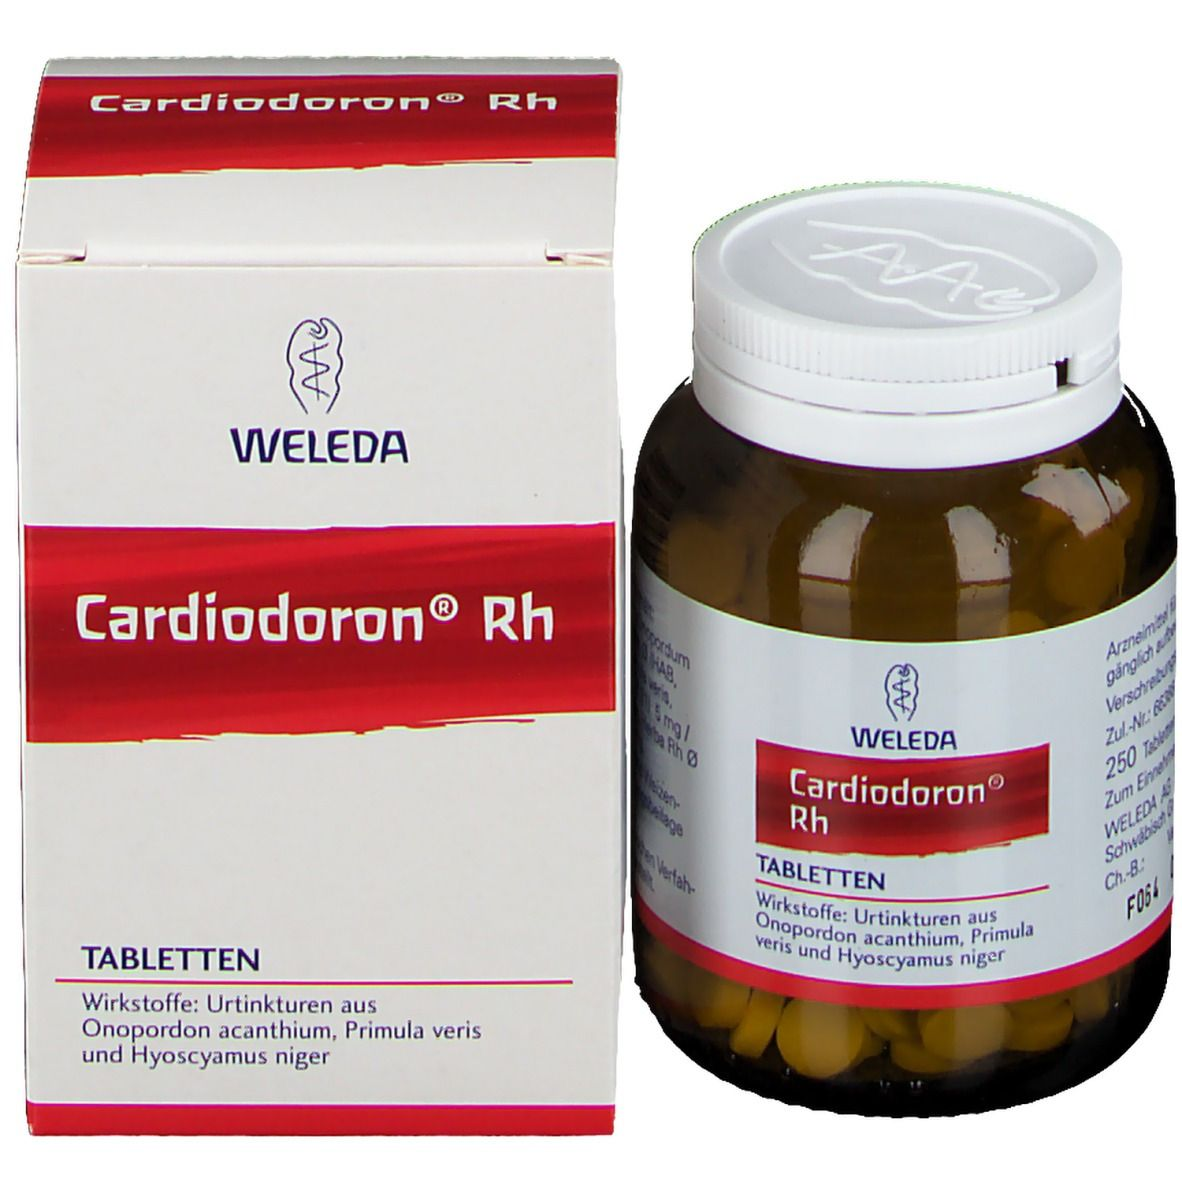 Weleda Cardiodoron RH Tabletten